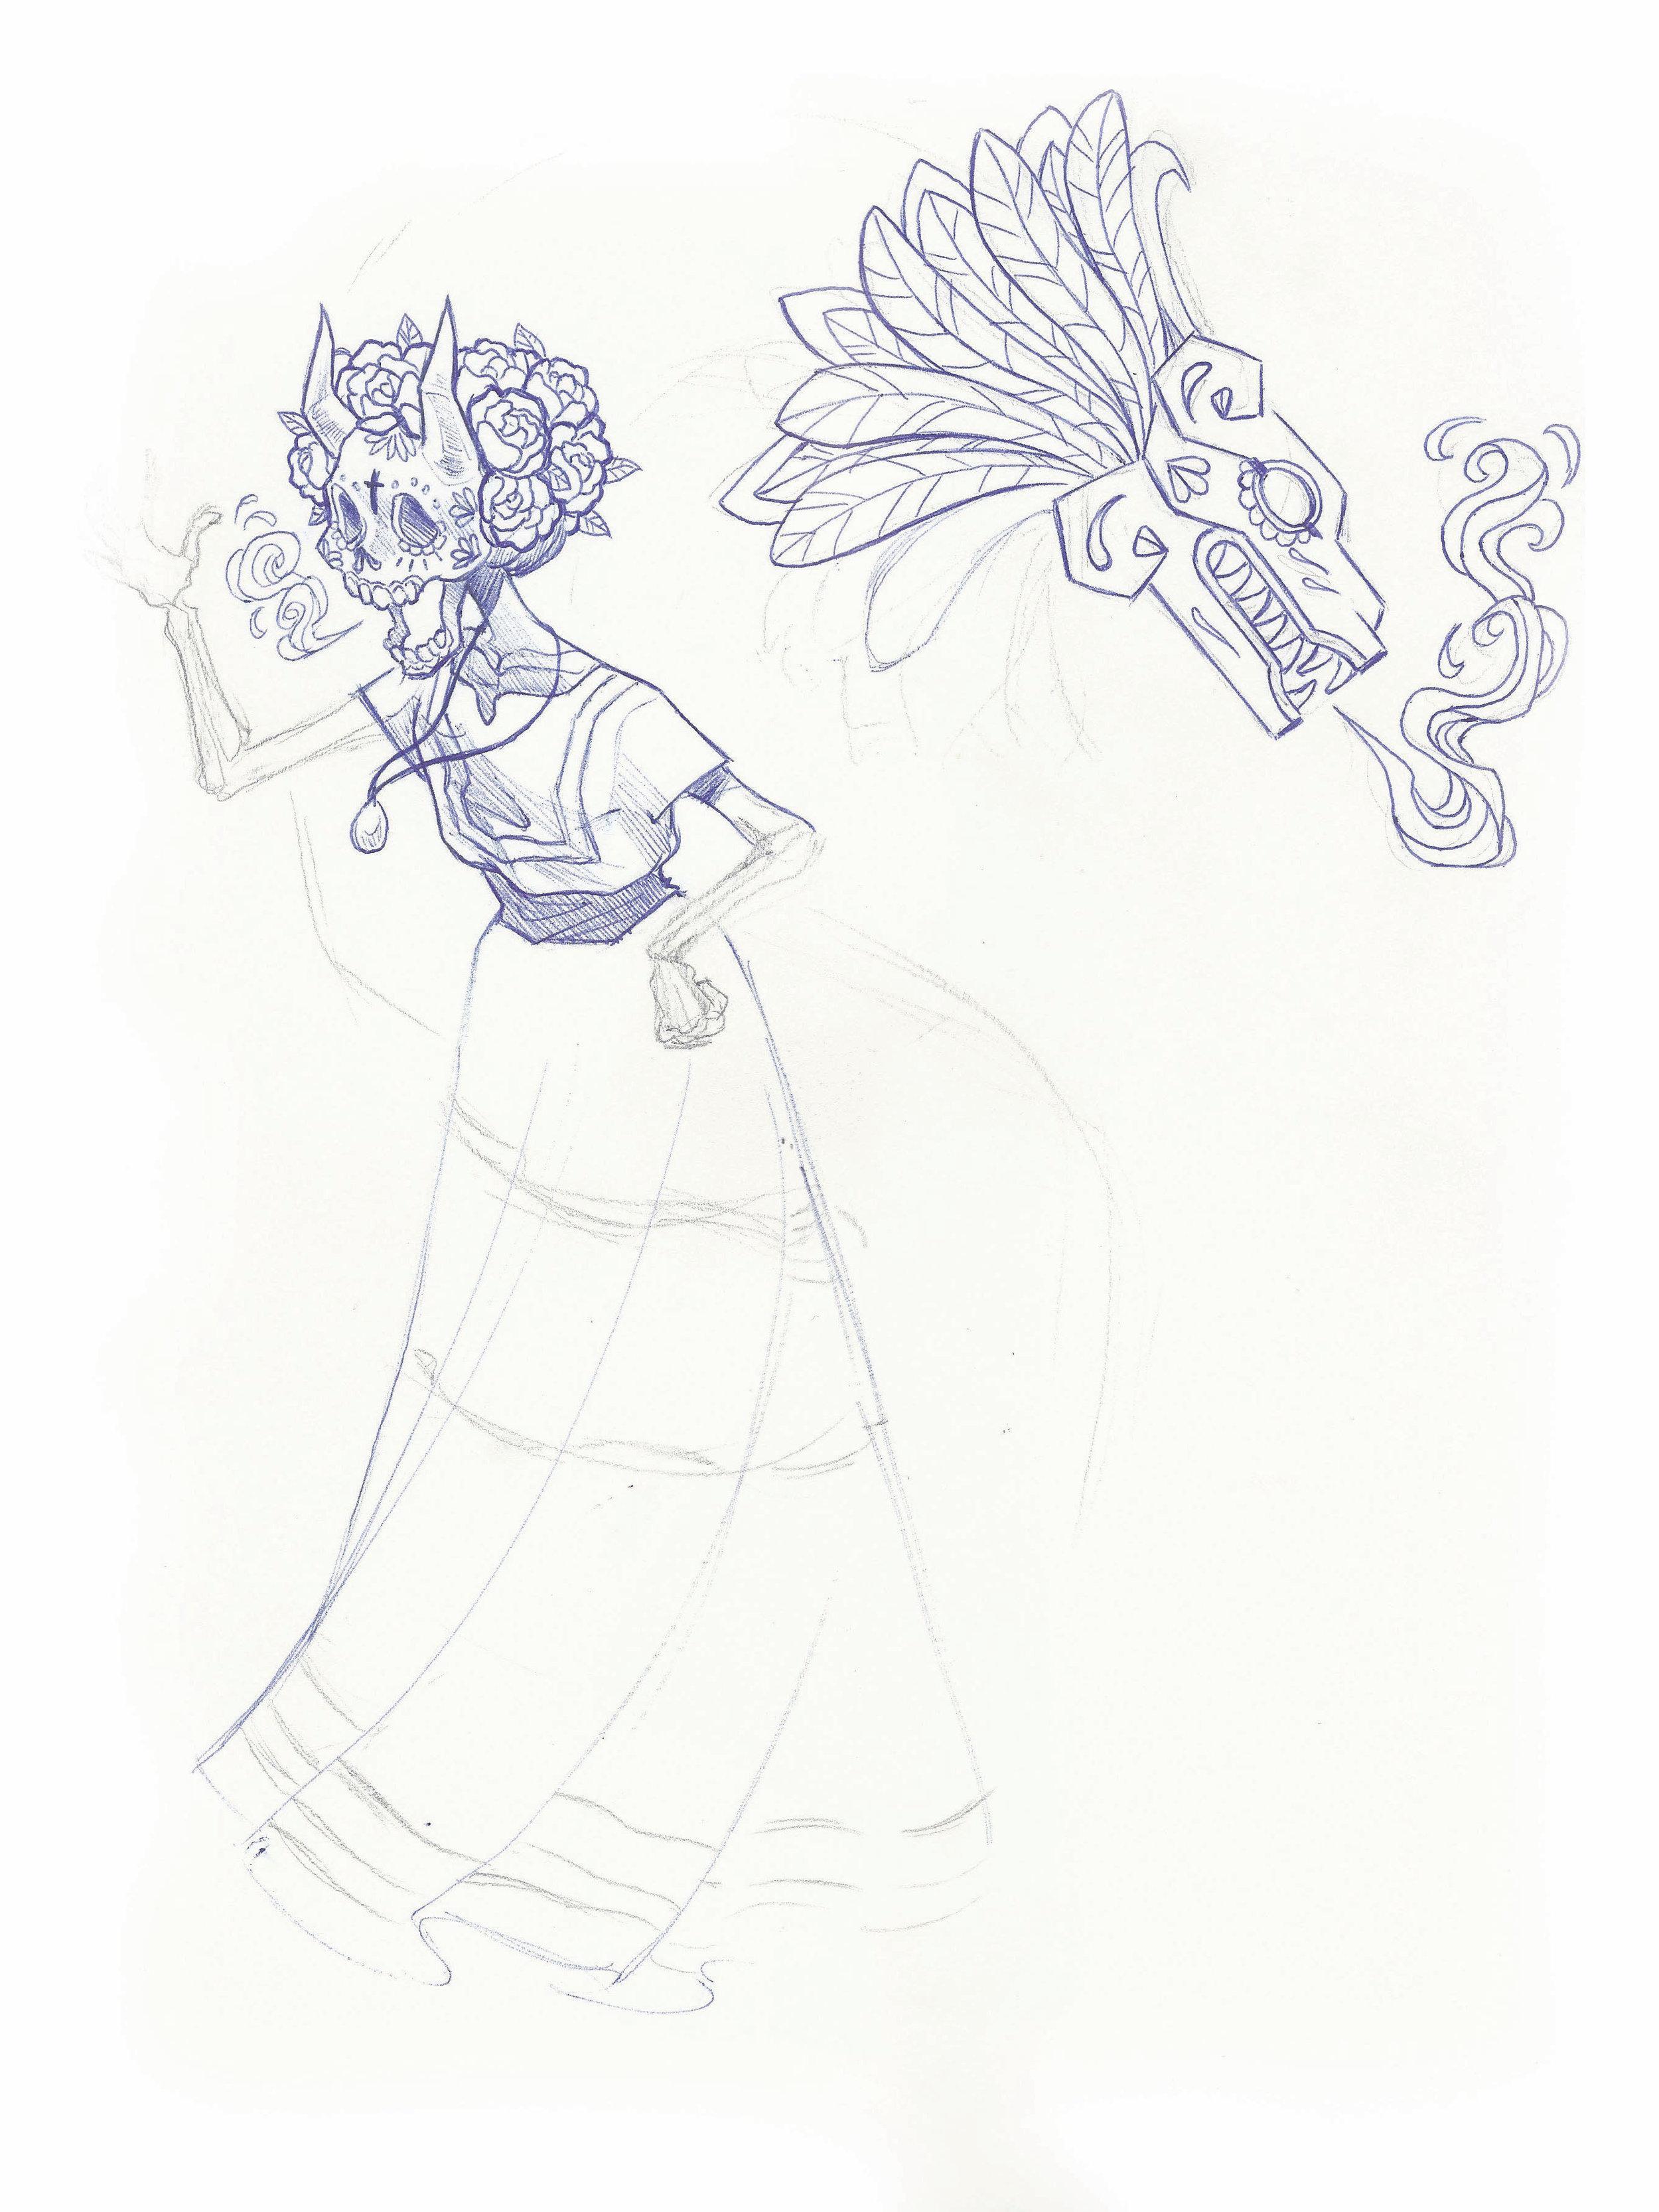 Quetzal_Sketch_5.jpg